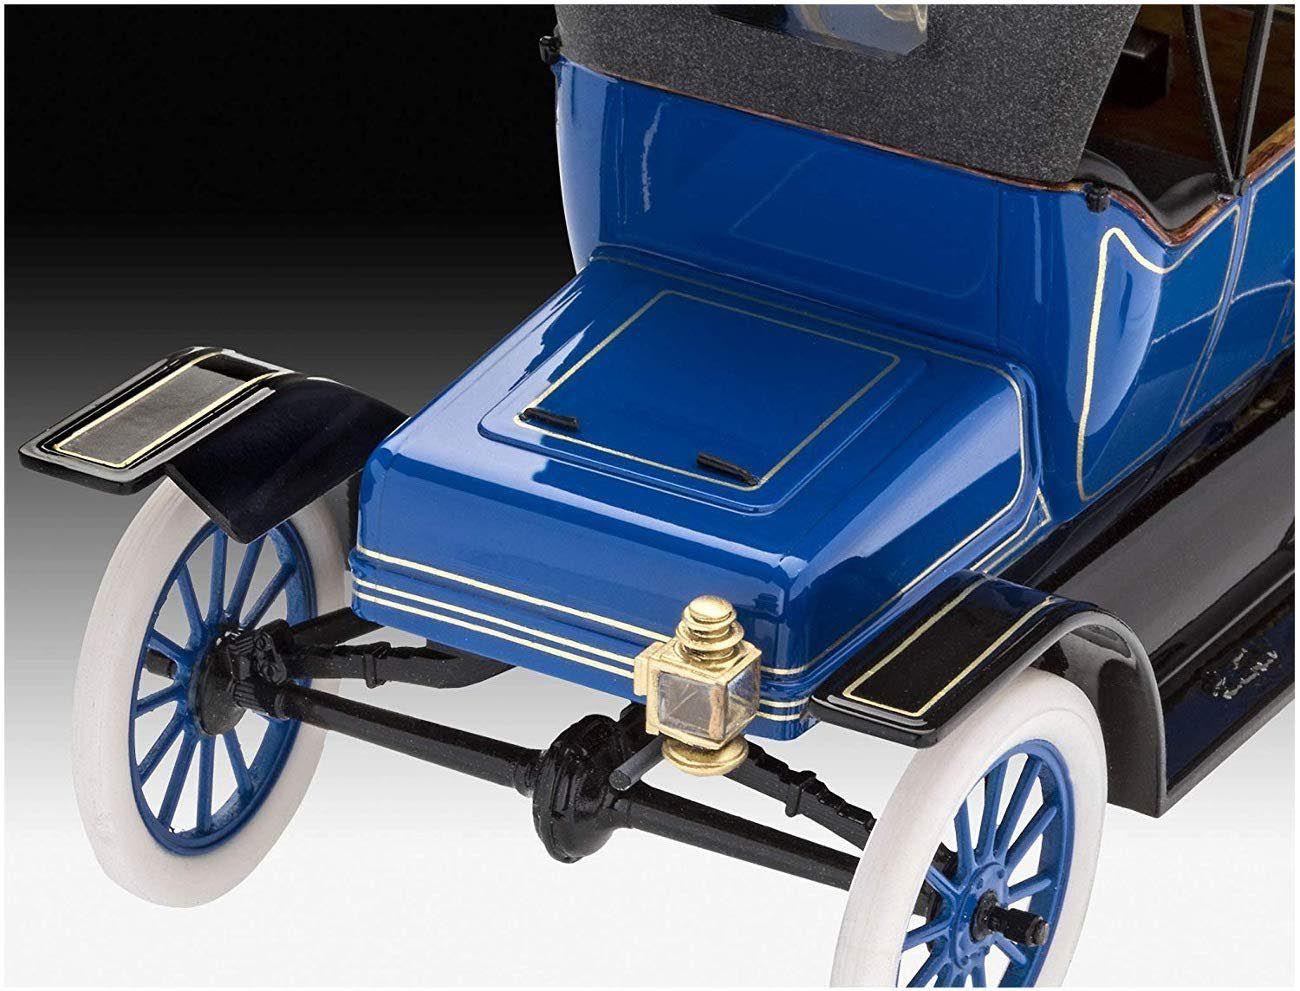 Ford Model T Roadster 1913 - 1/24 - Revell 07661  - BLIMPS COMÉRCIO ELETRÔNICO